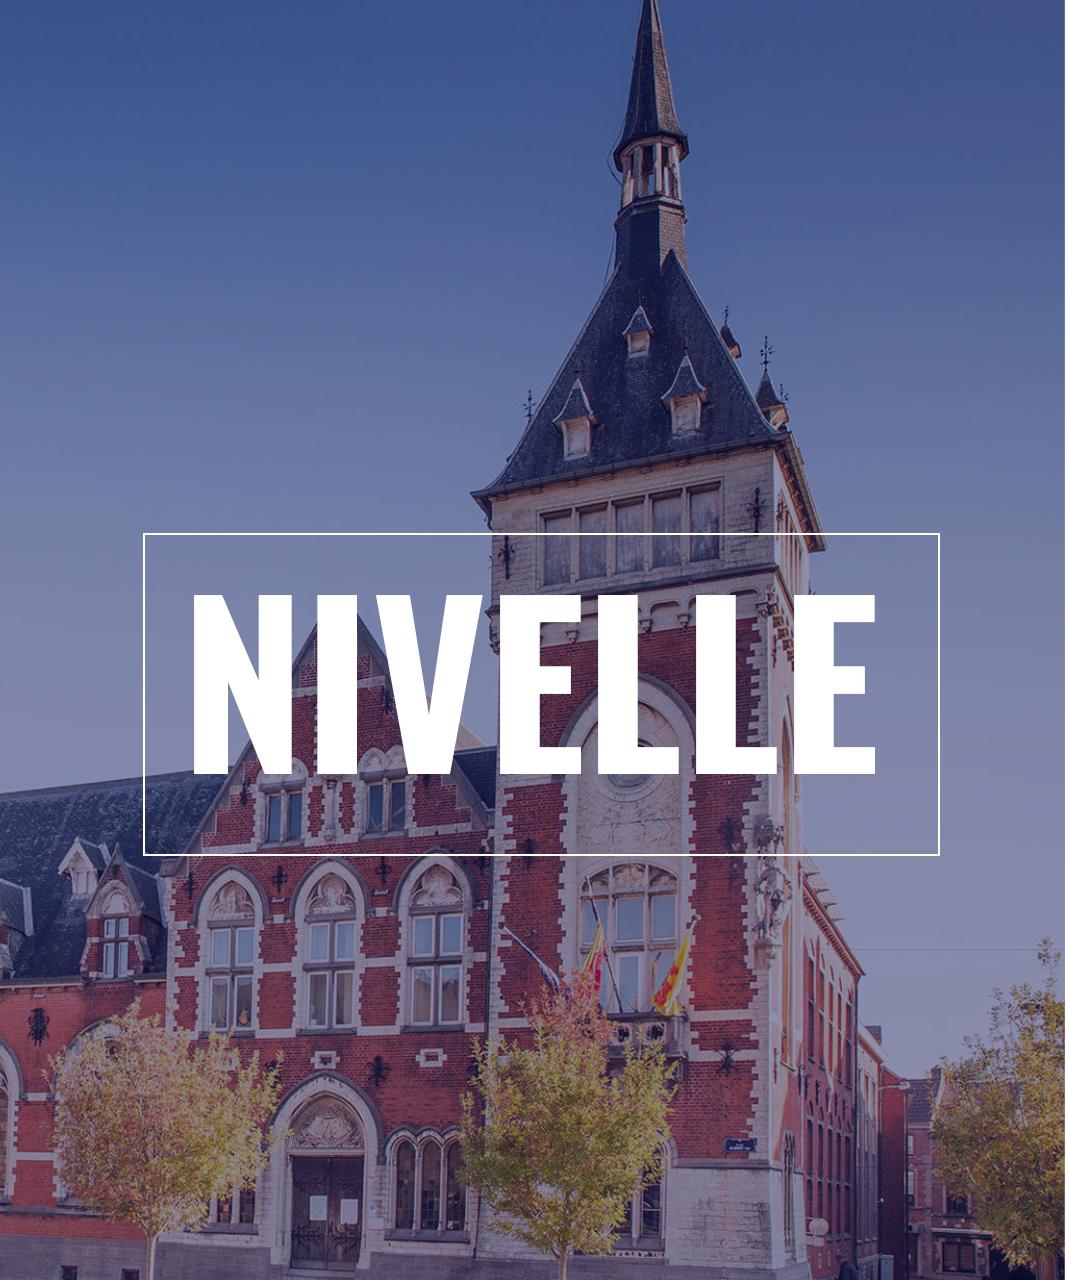 visite-nivelle-belgique